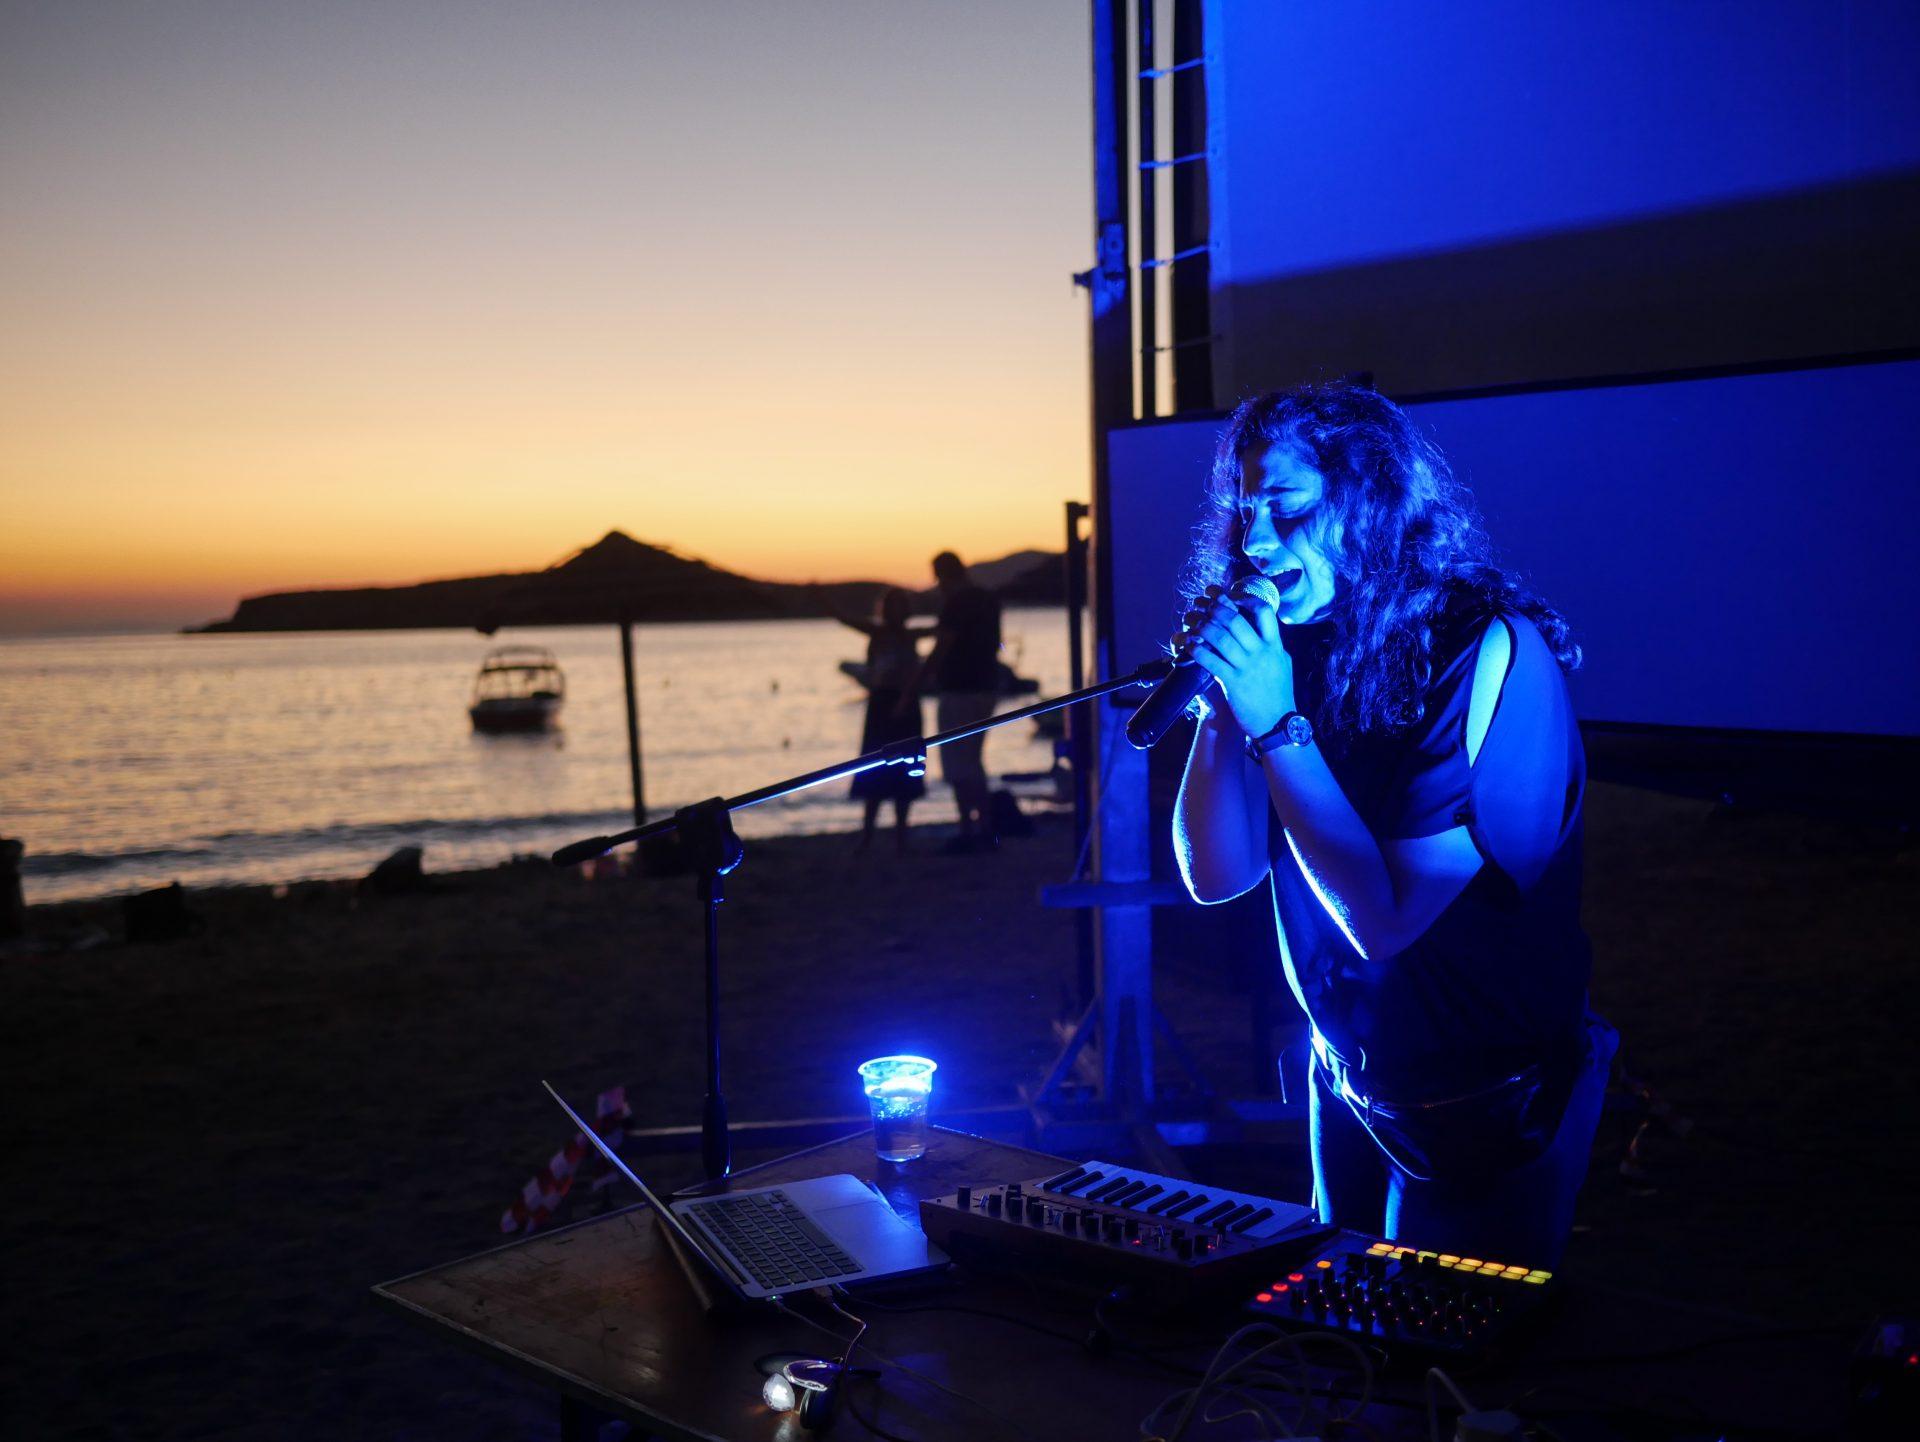 Nada El Shazly performing at Komito Beach [Photo by Myrto Tzima]